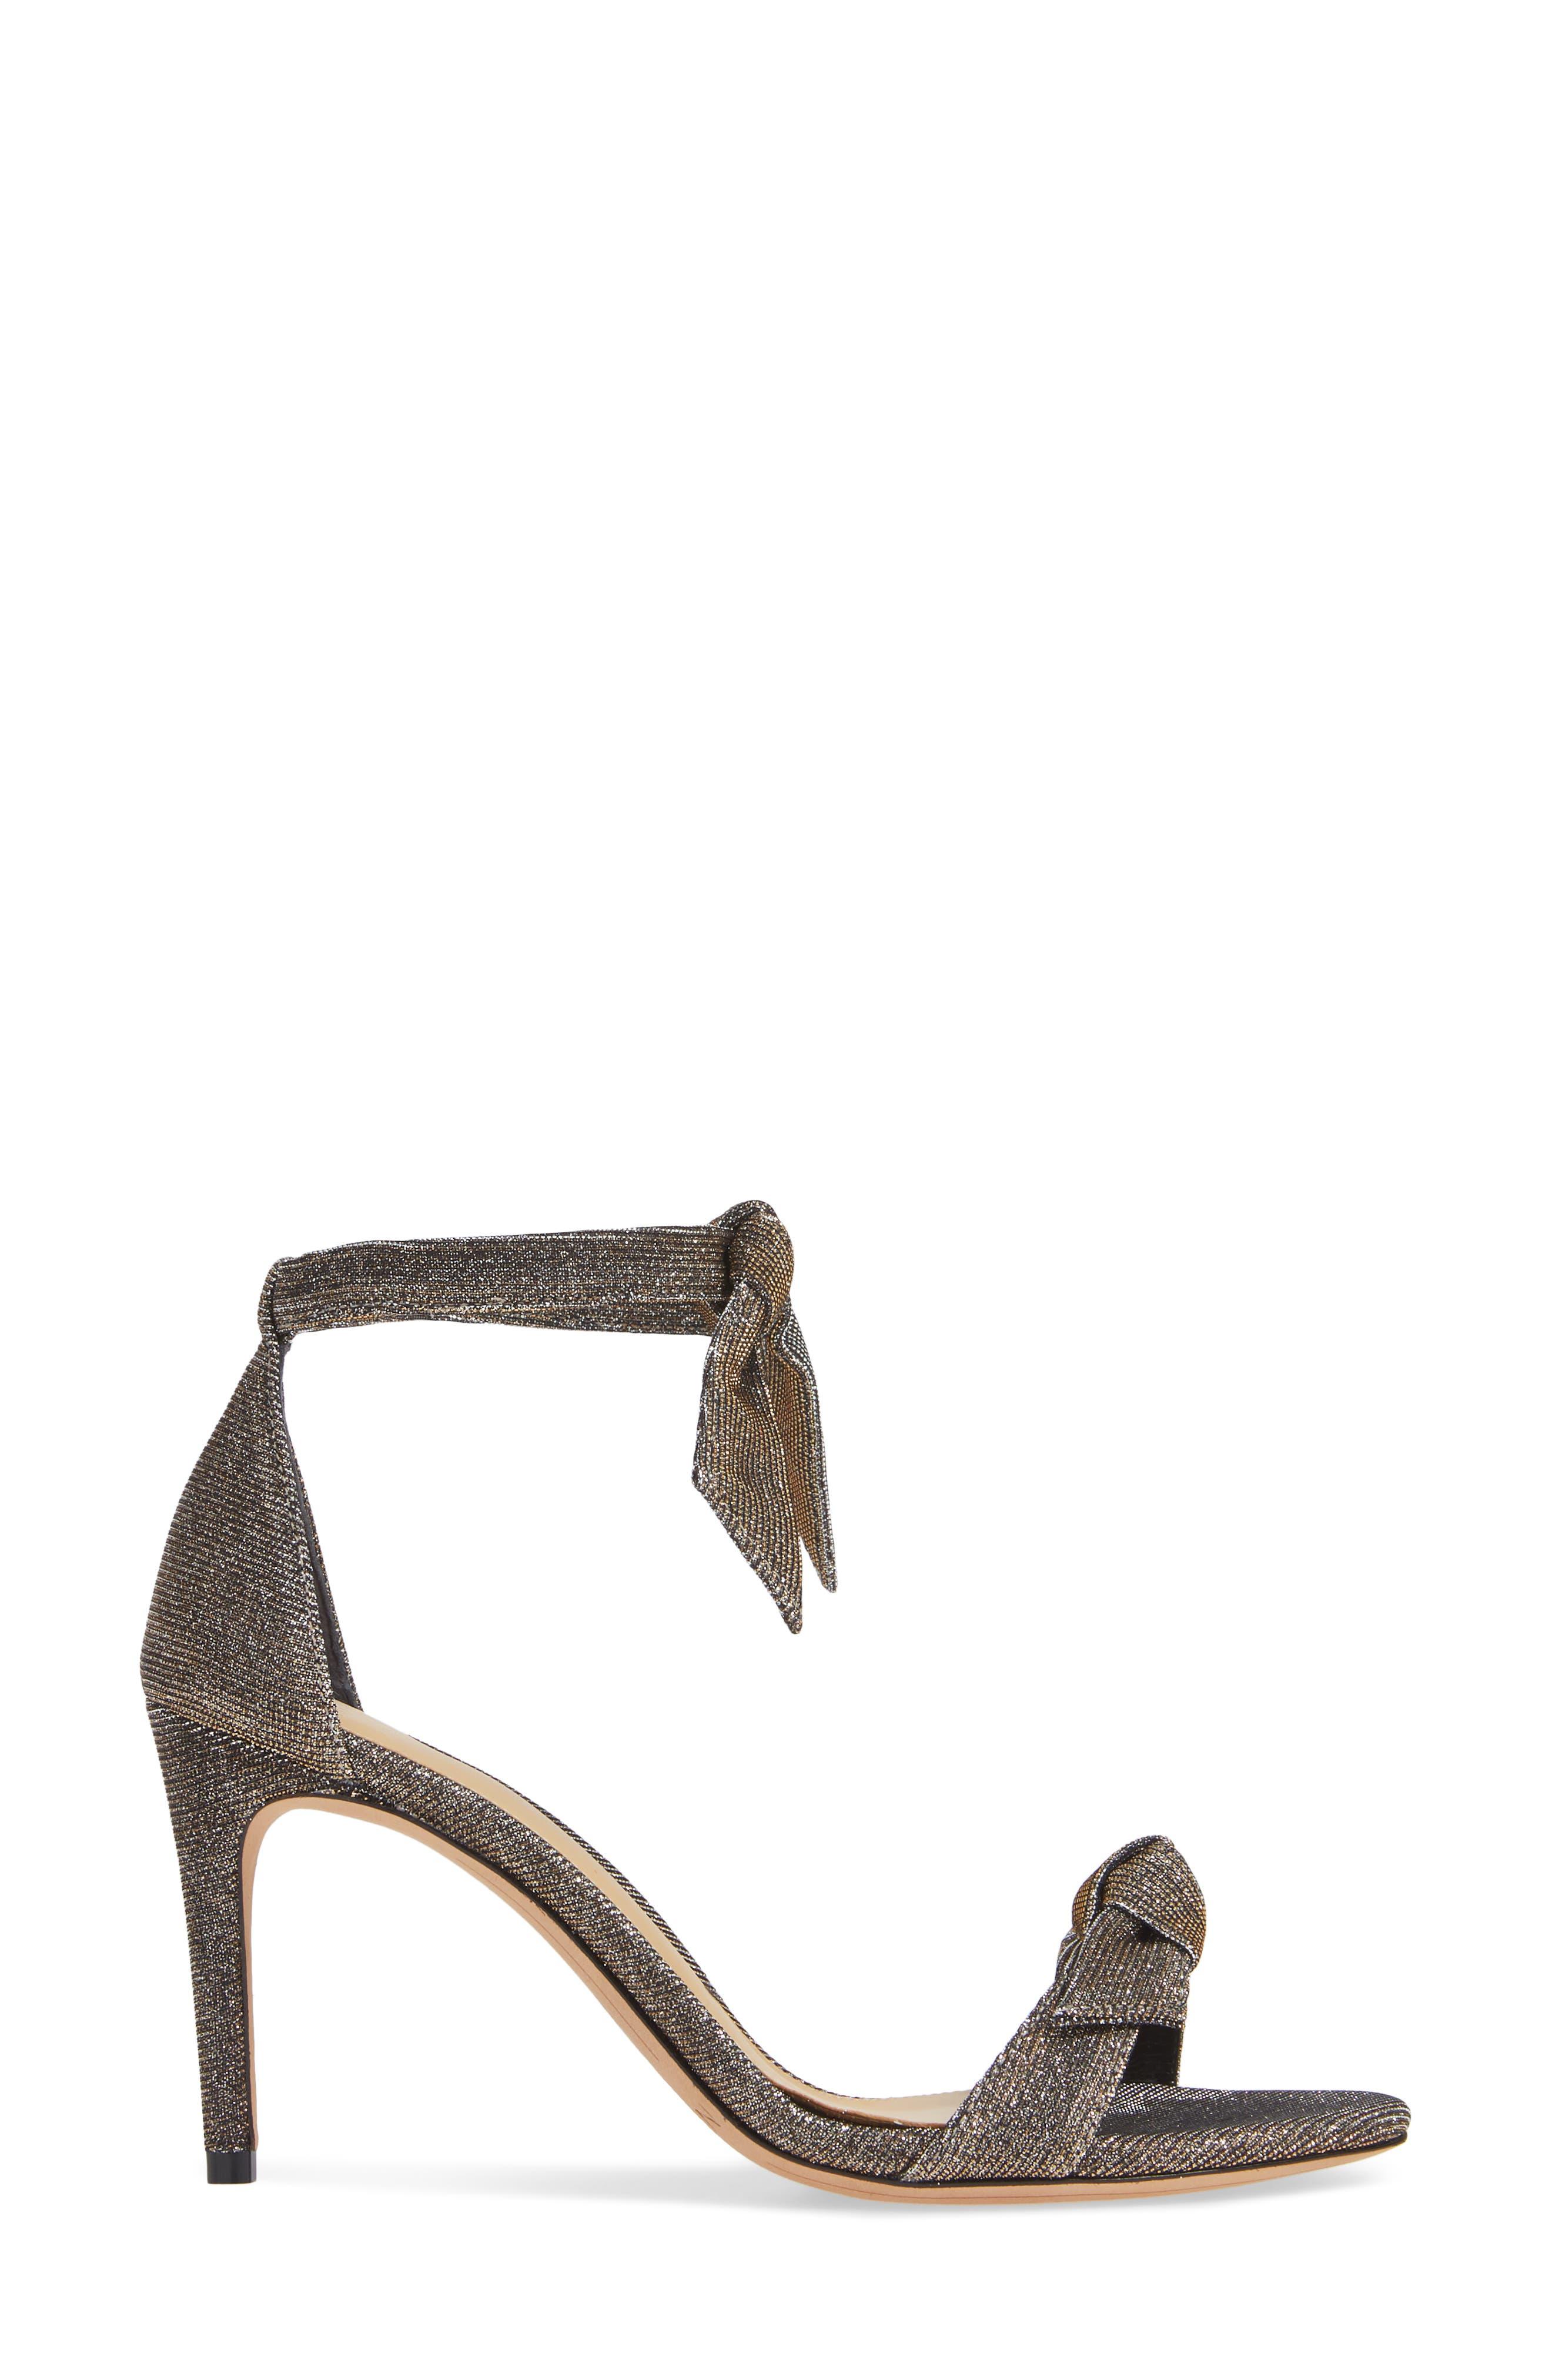 Clarita Ankle Strap Sandal,                             Alternate thumbnail 3, color,                             SILVER